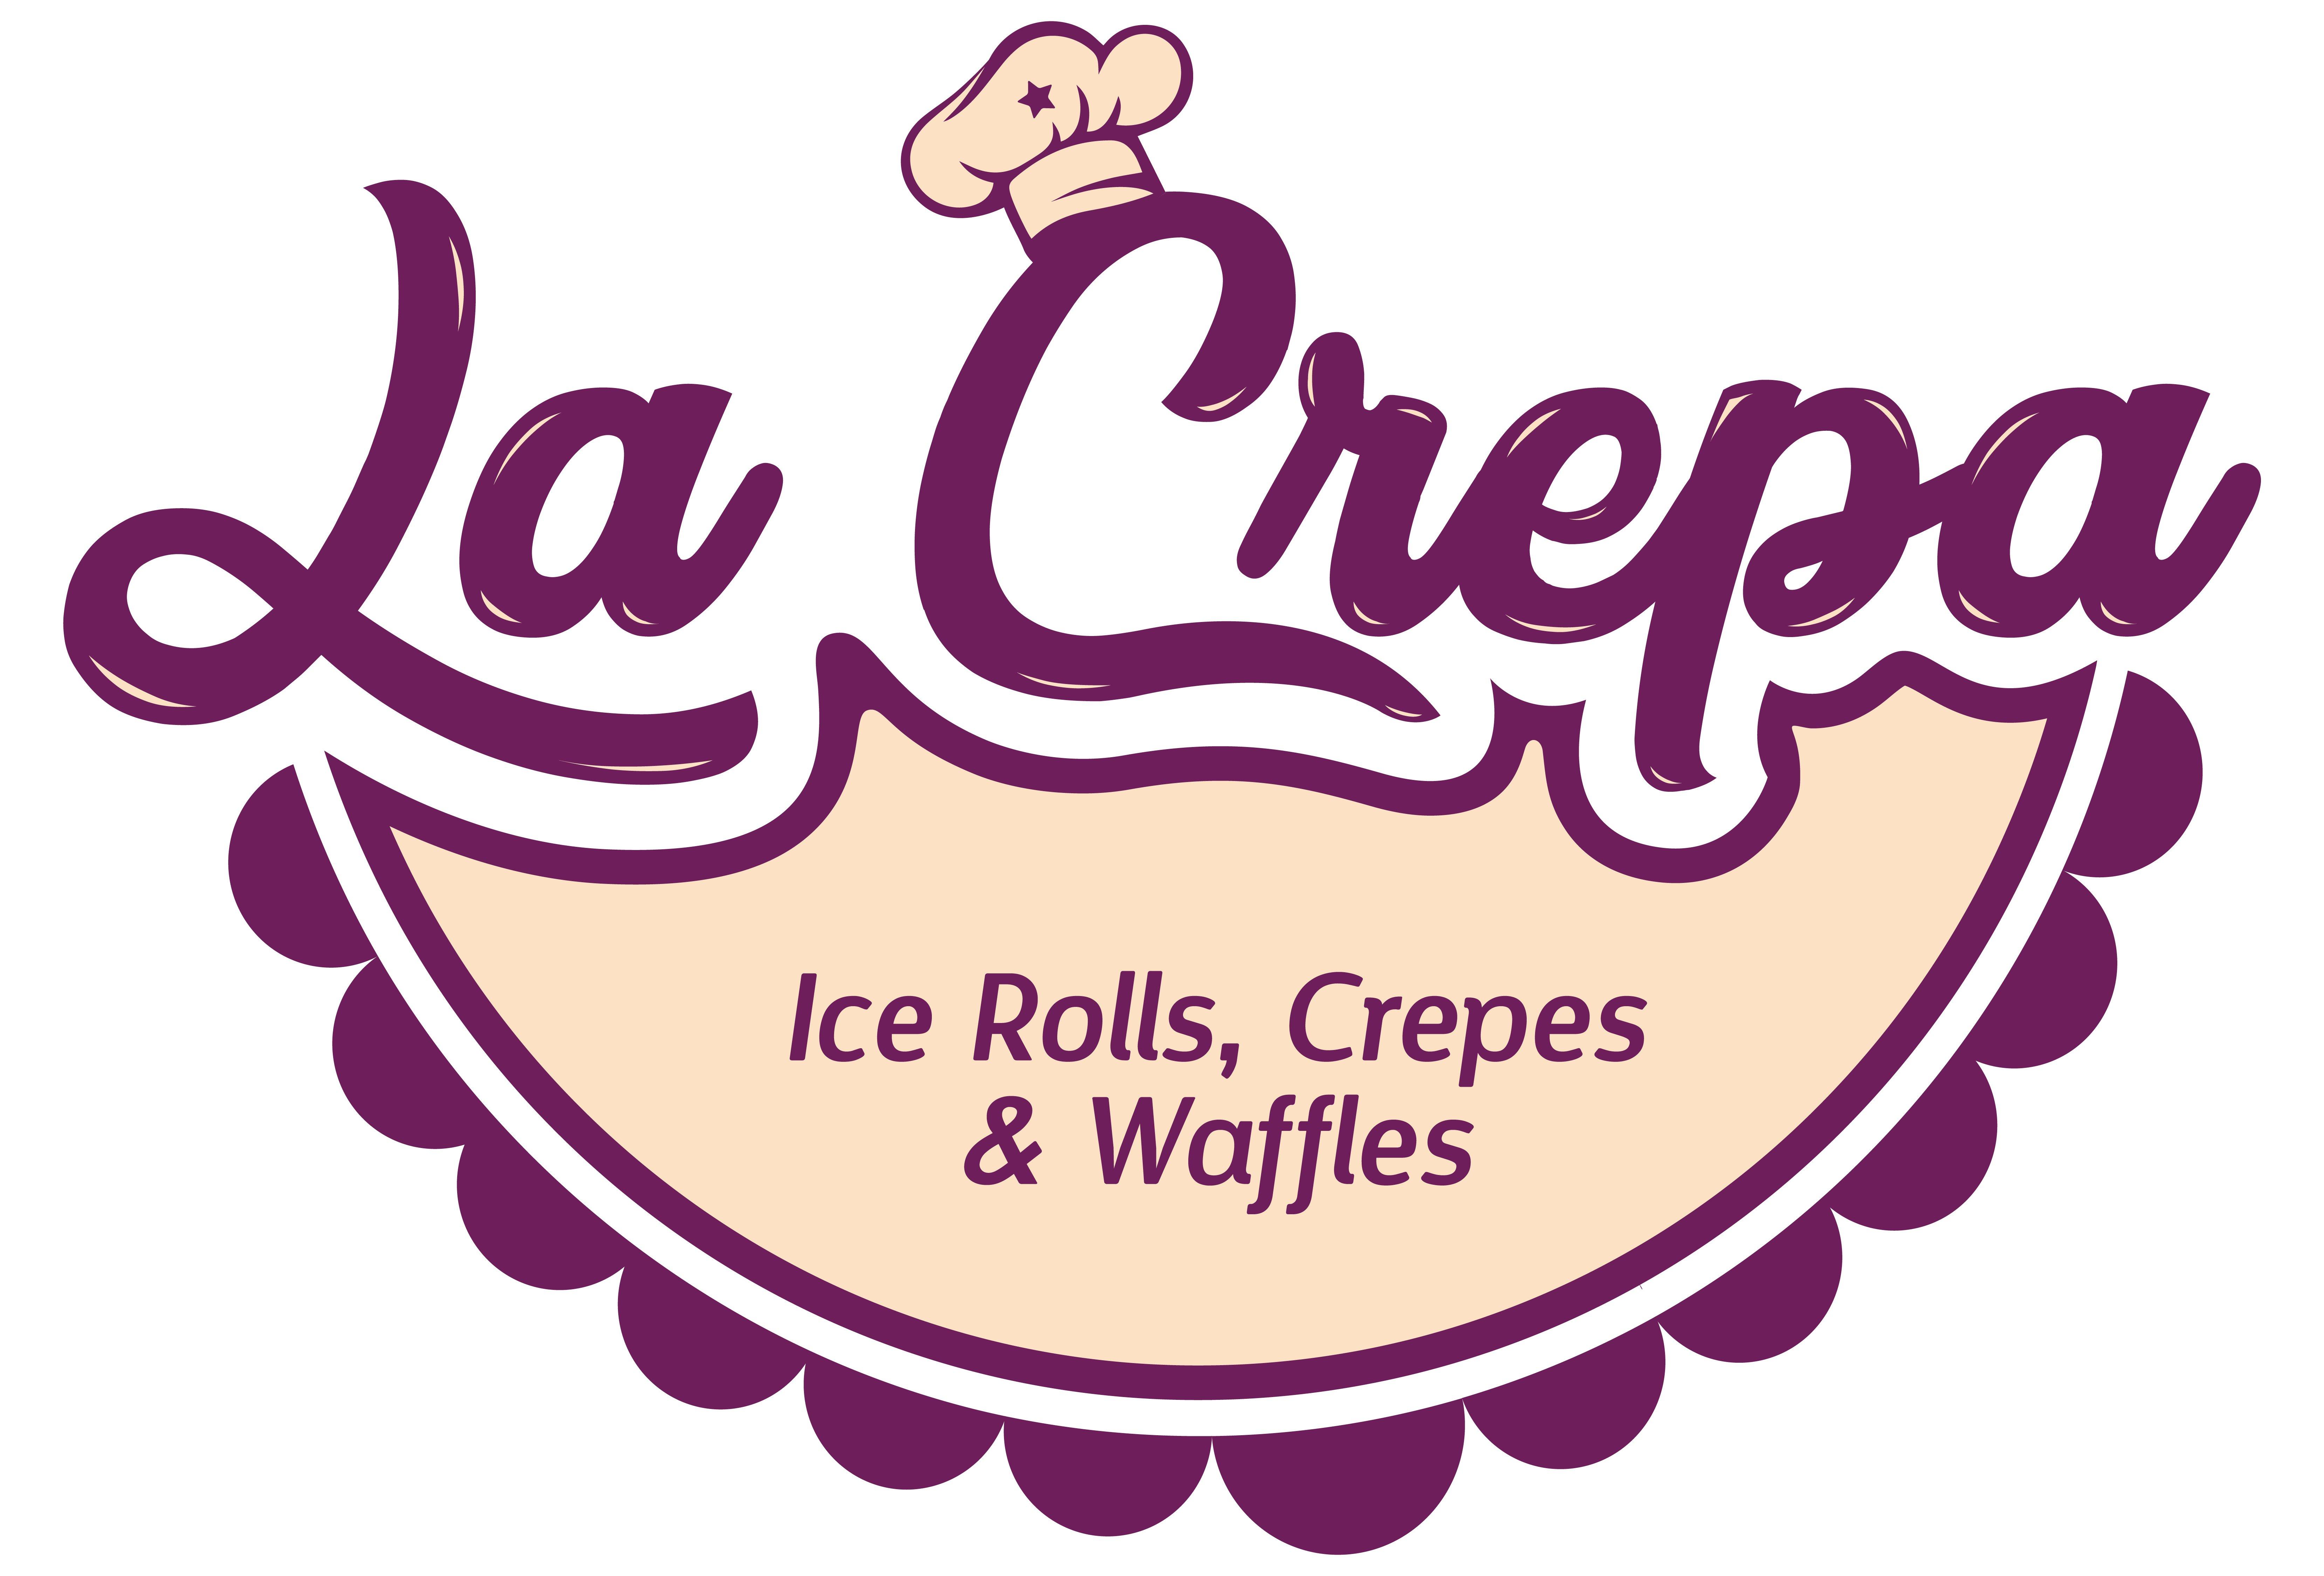 La Crepa Ice Rolls, Crepes & Waffles